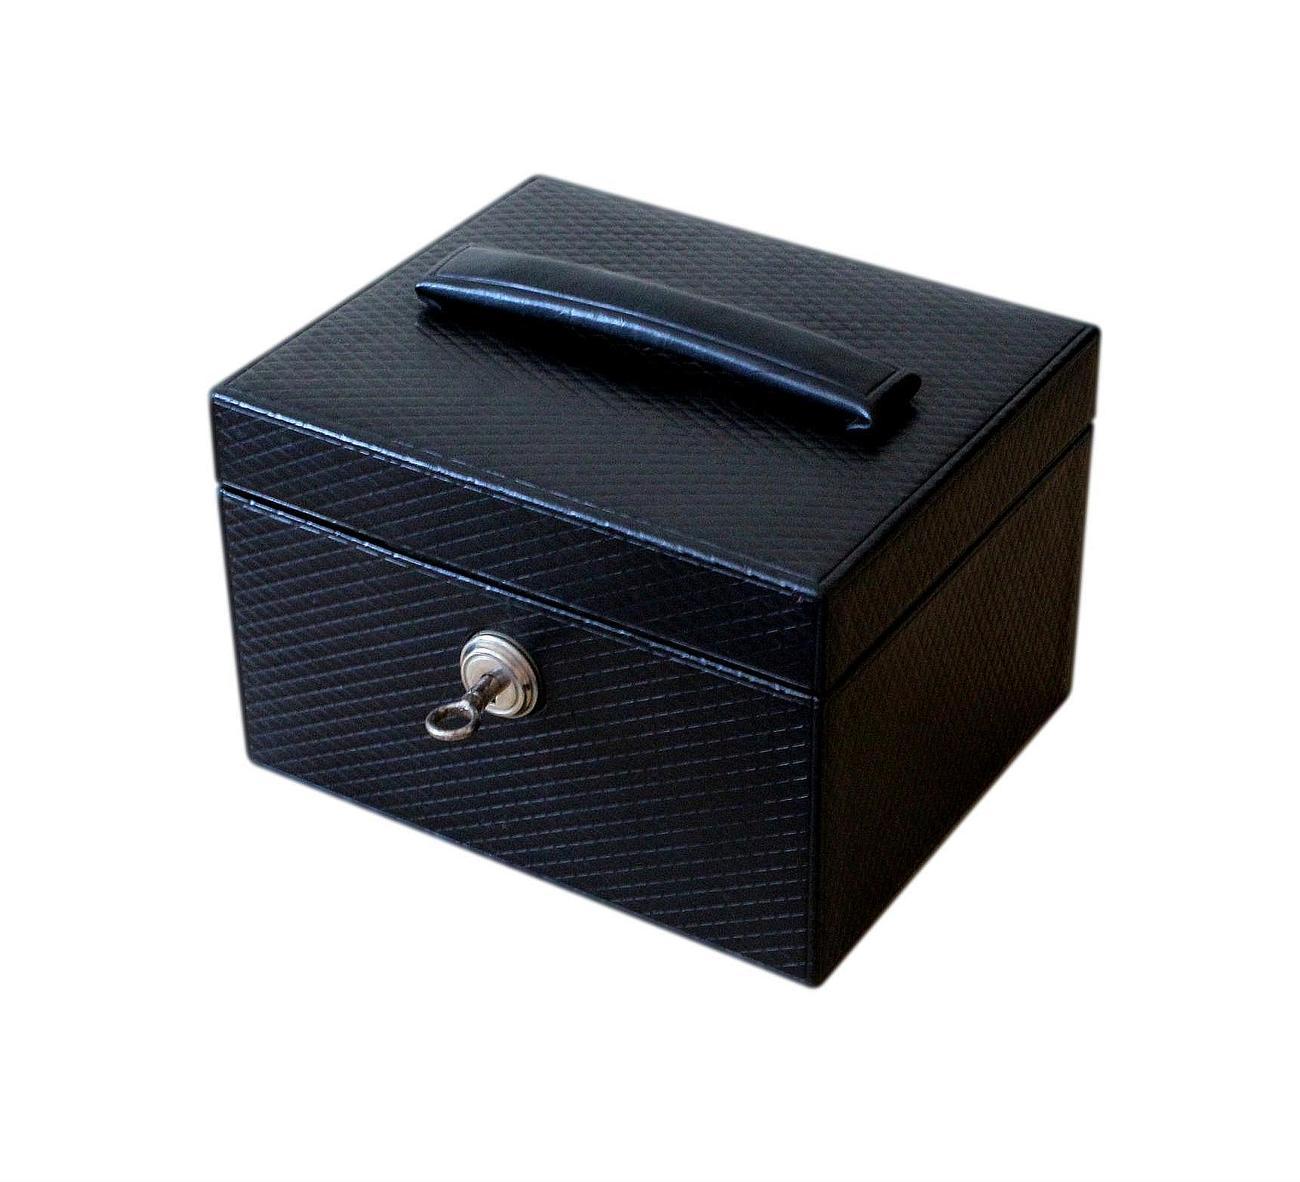 Antique_leather_Bramah_jewellery_box_2.jpg